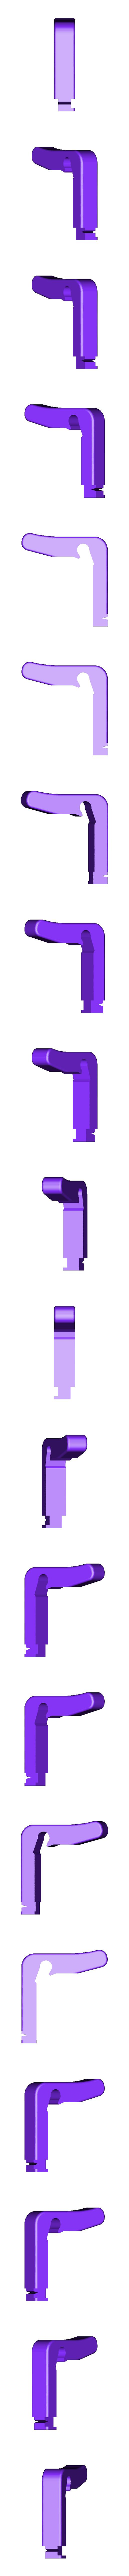 trigger.stl Download free STL file Joystick PS4 • 3D print object, Osichan